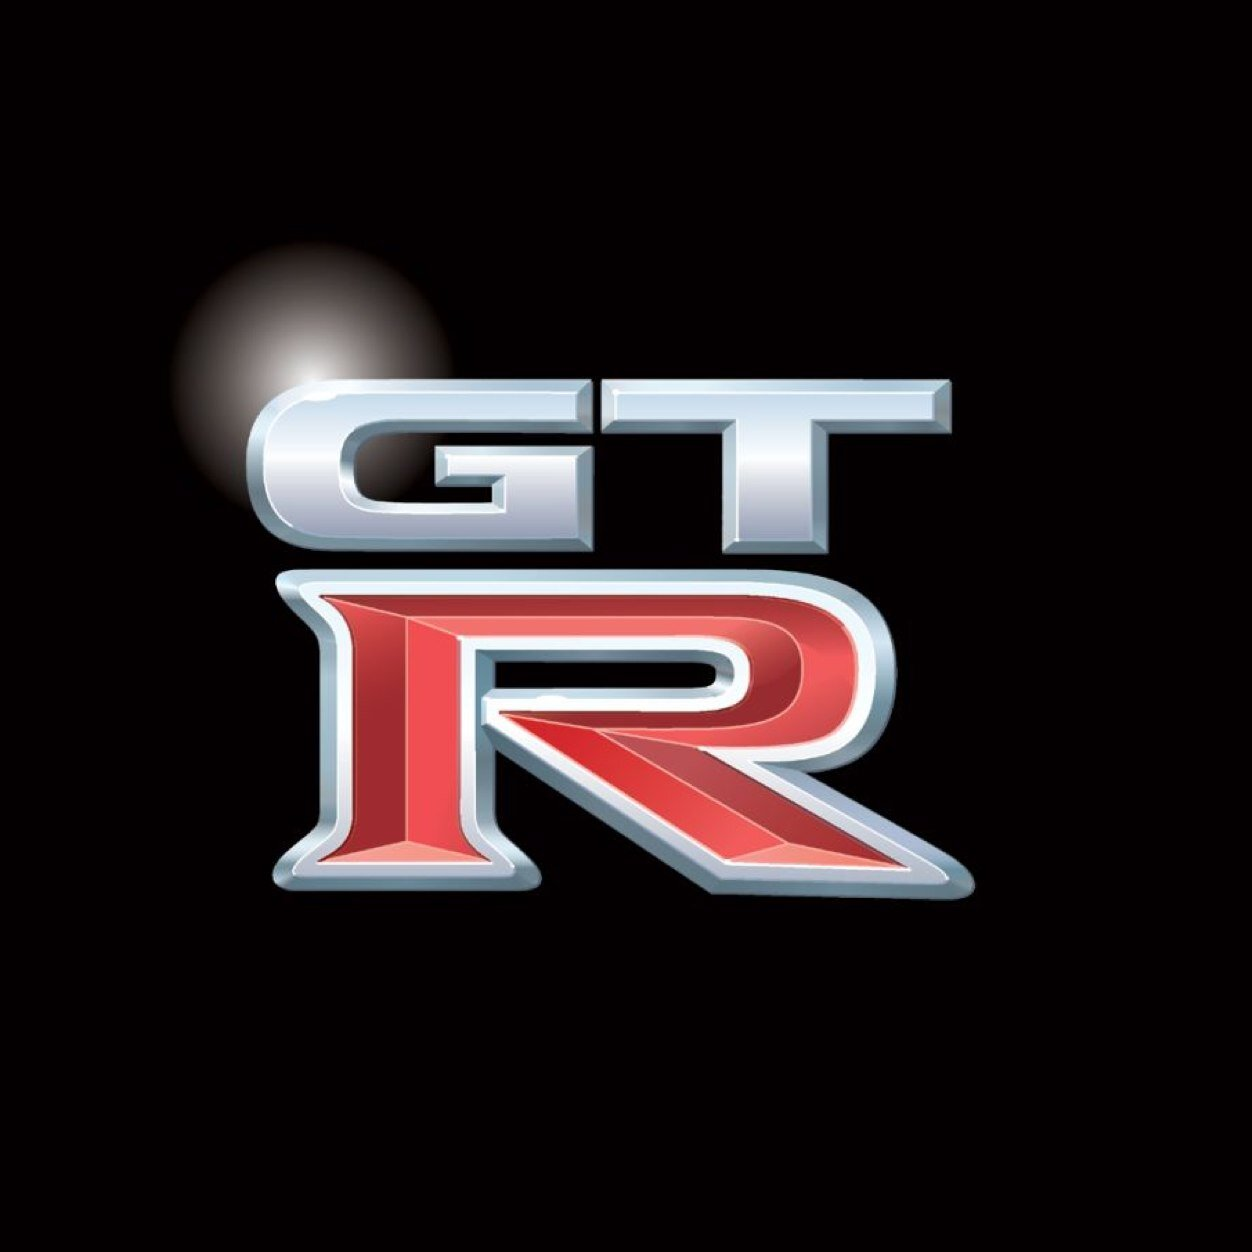 Nissan Logo Wallpaper: Nissan GT-R (@NissanGTR_)